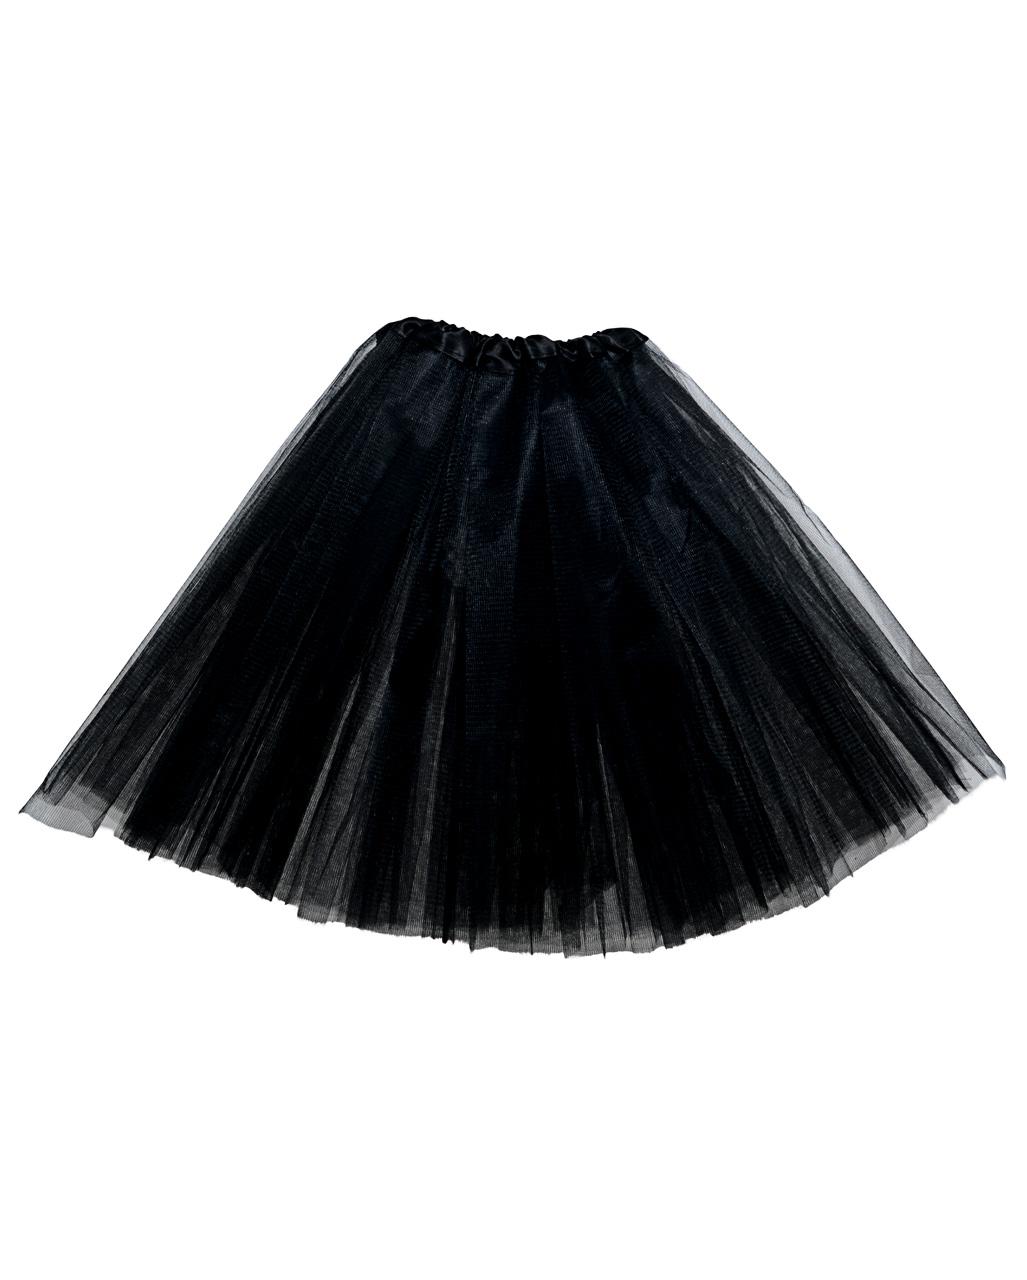 Girls Black Swan Witch dancer Ballet costume Tutu dress Fancy dress Halloween